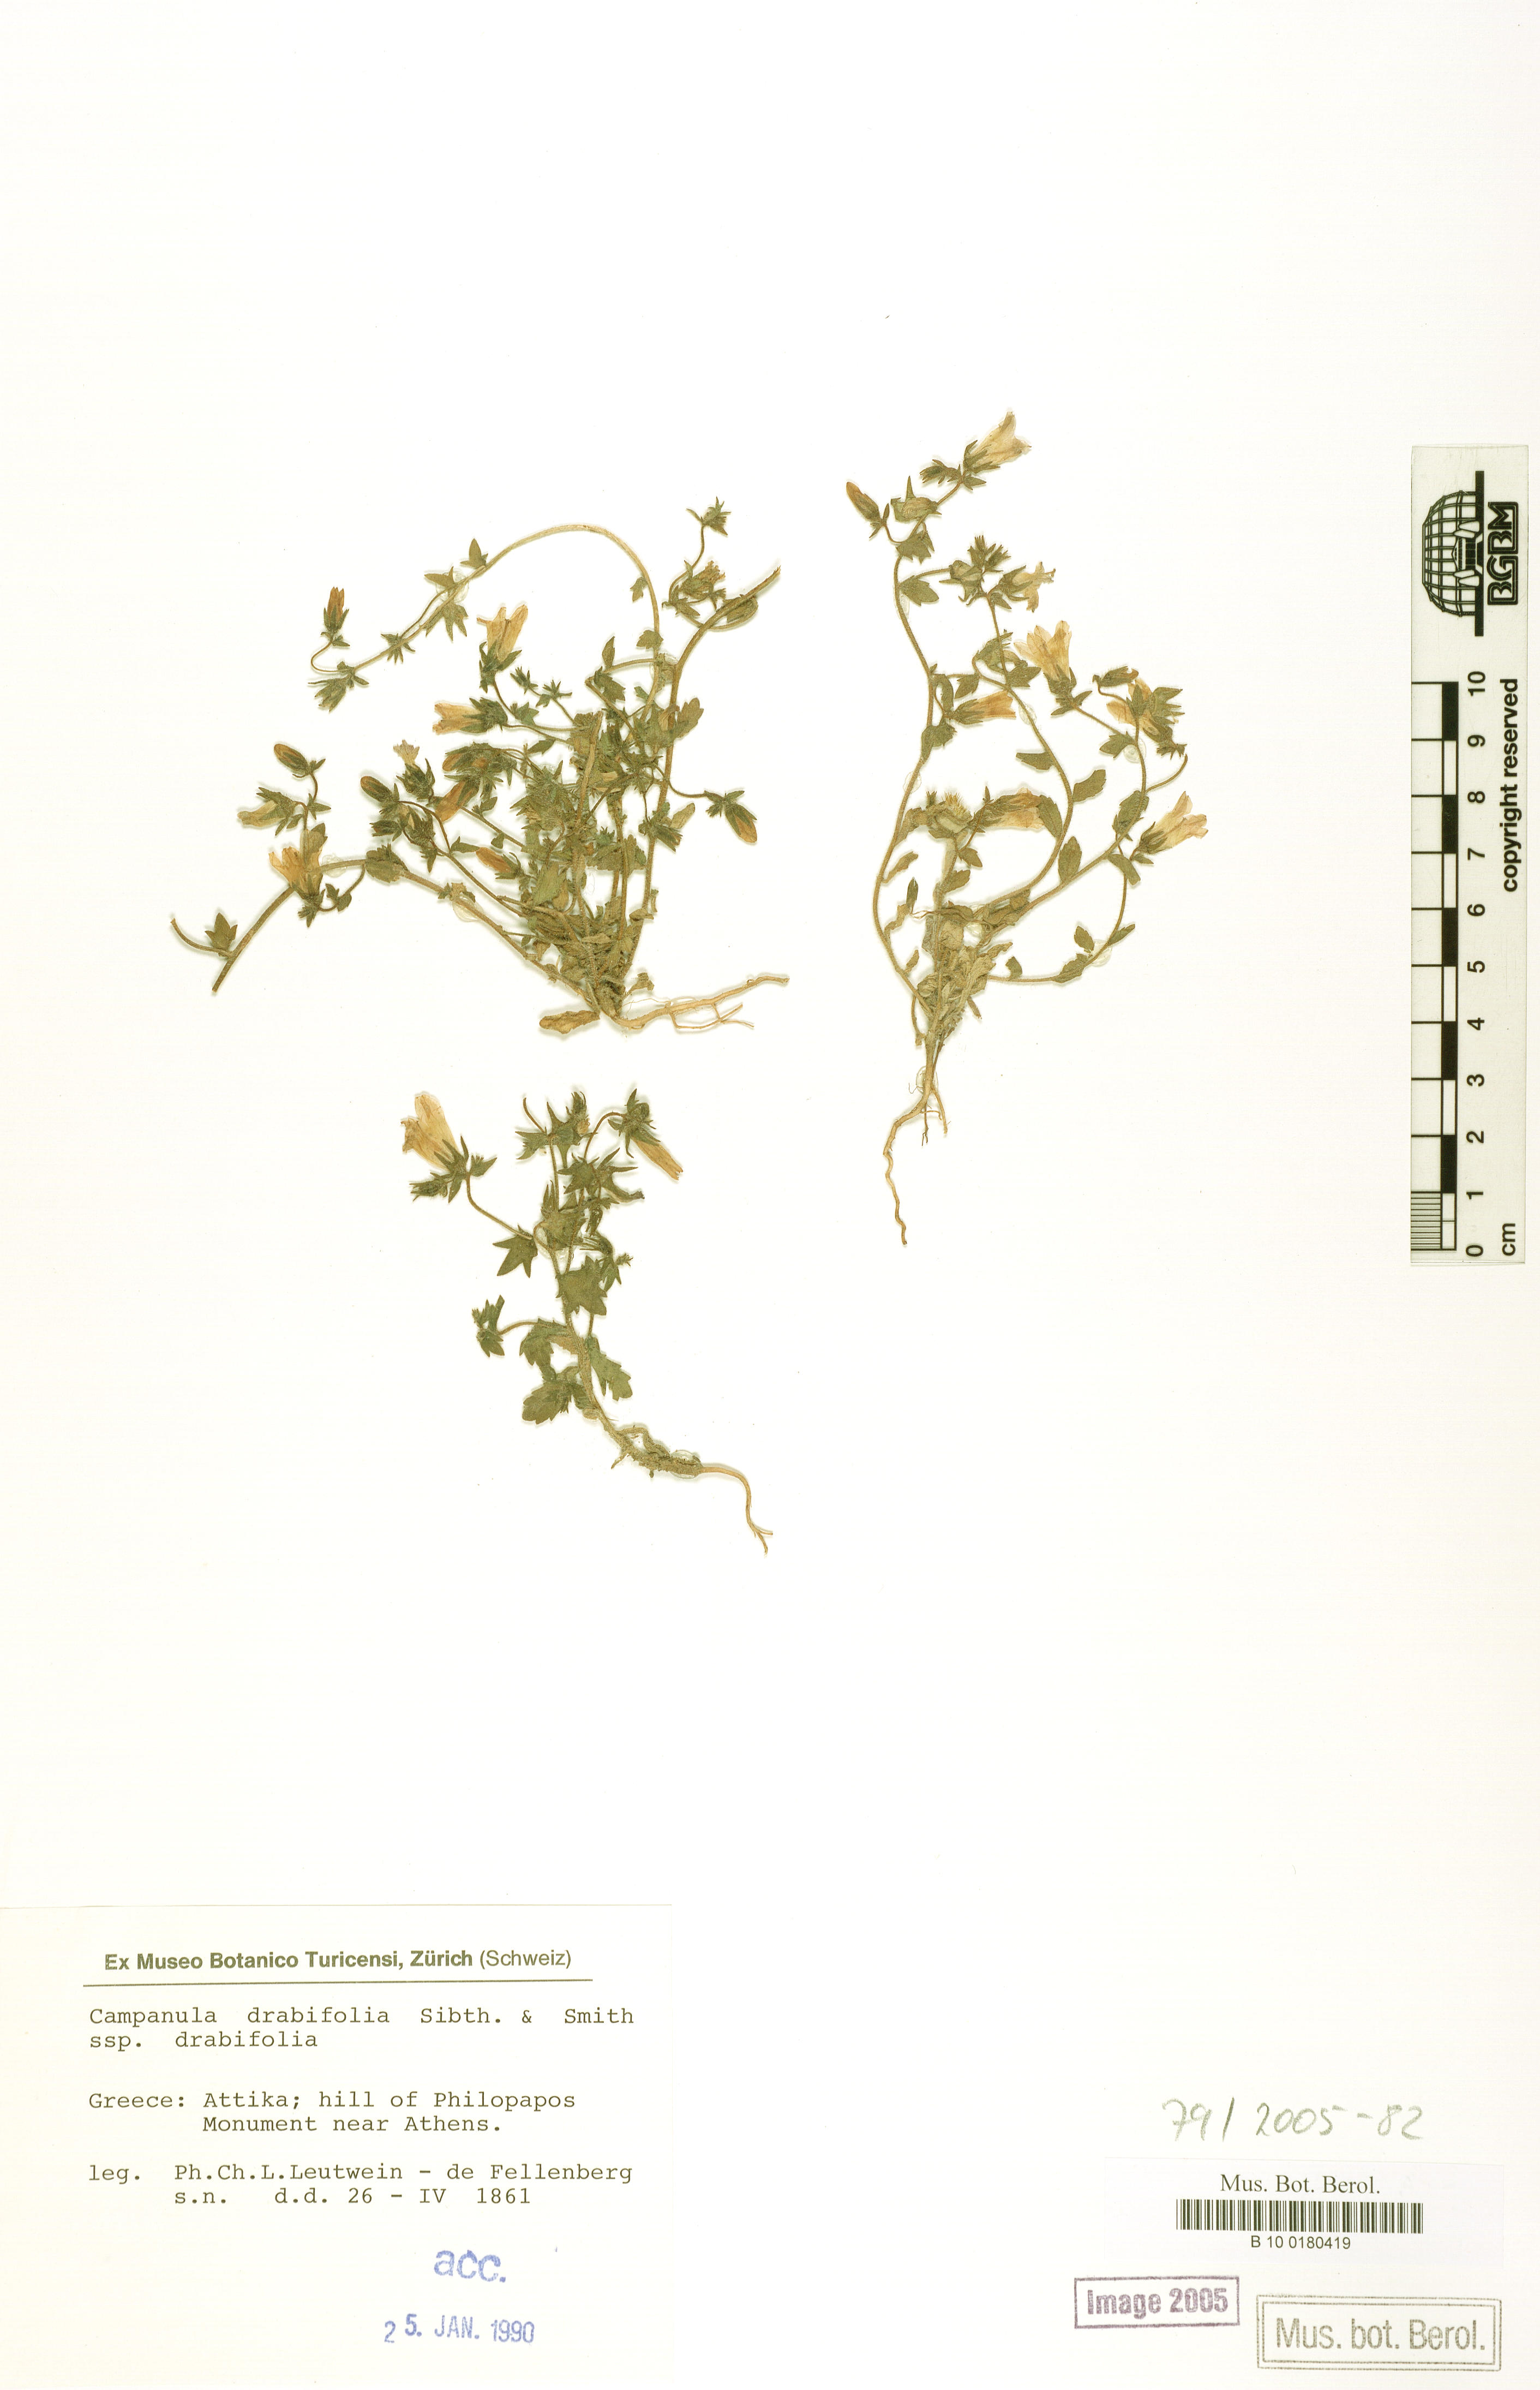 http://ww2.bgbm.org/herbarium/images/B/10/01/80/41/B_10_0180419.jpg